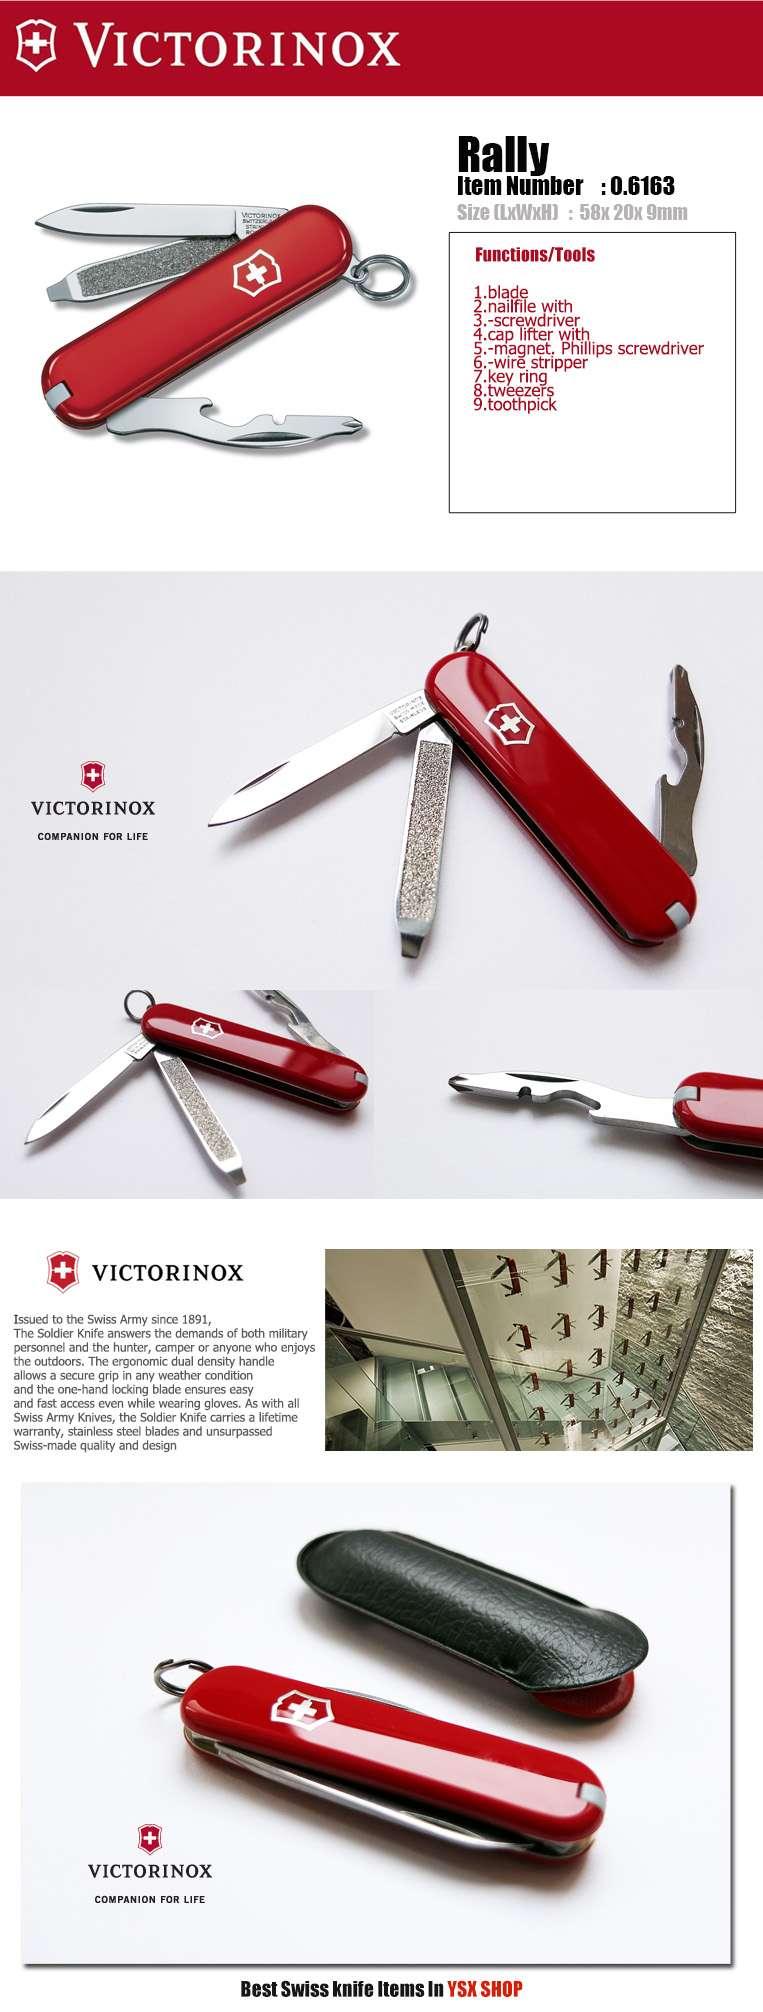 Victorinox Swiss Army Knife 58mm Rally 9 Function Pocket